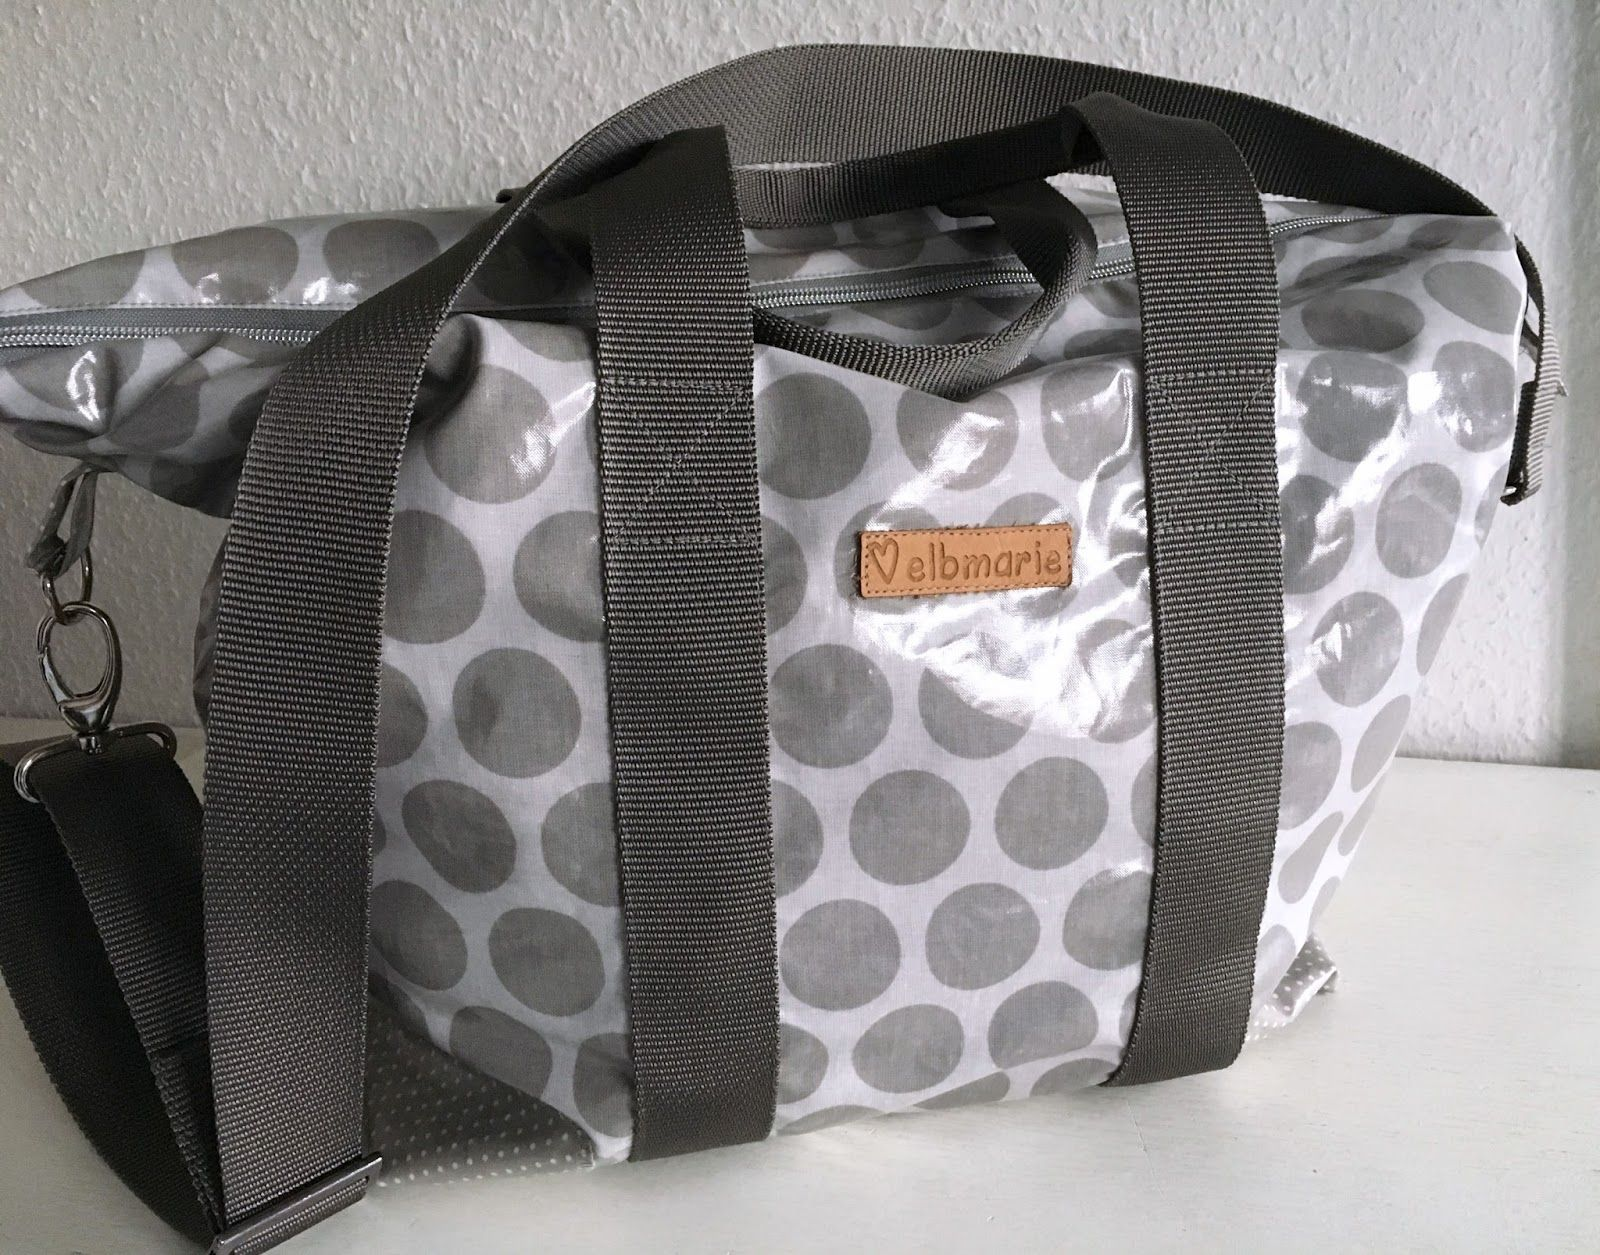 overnightbag sewn in oilcloth - for beginners Übernachtungstasche ...